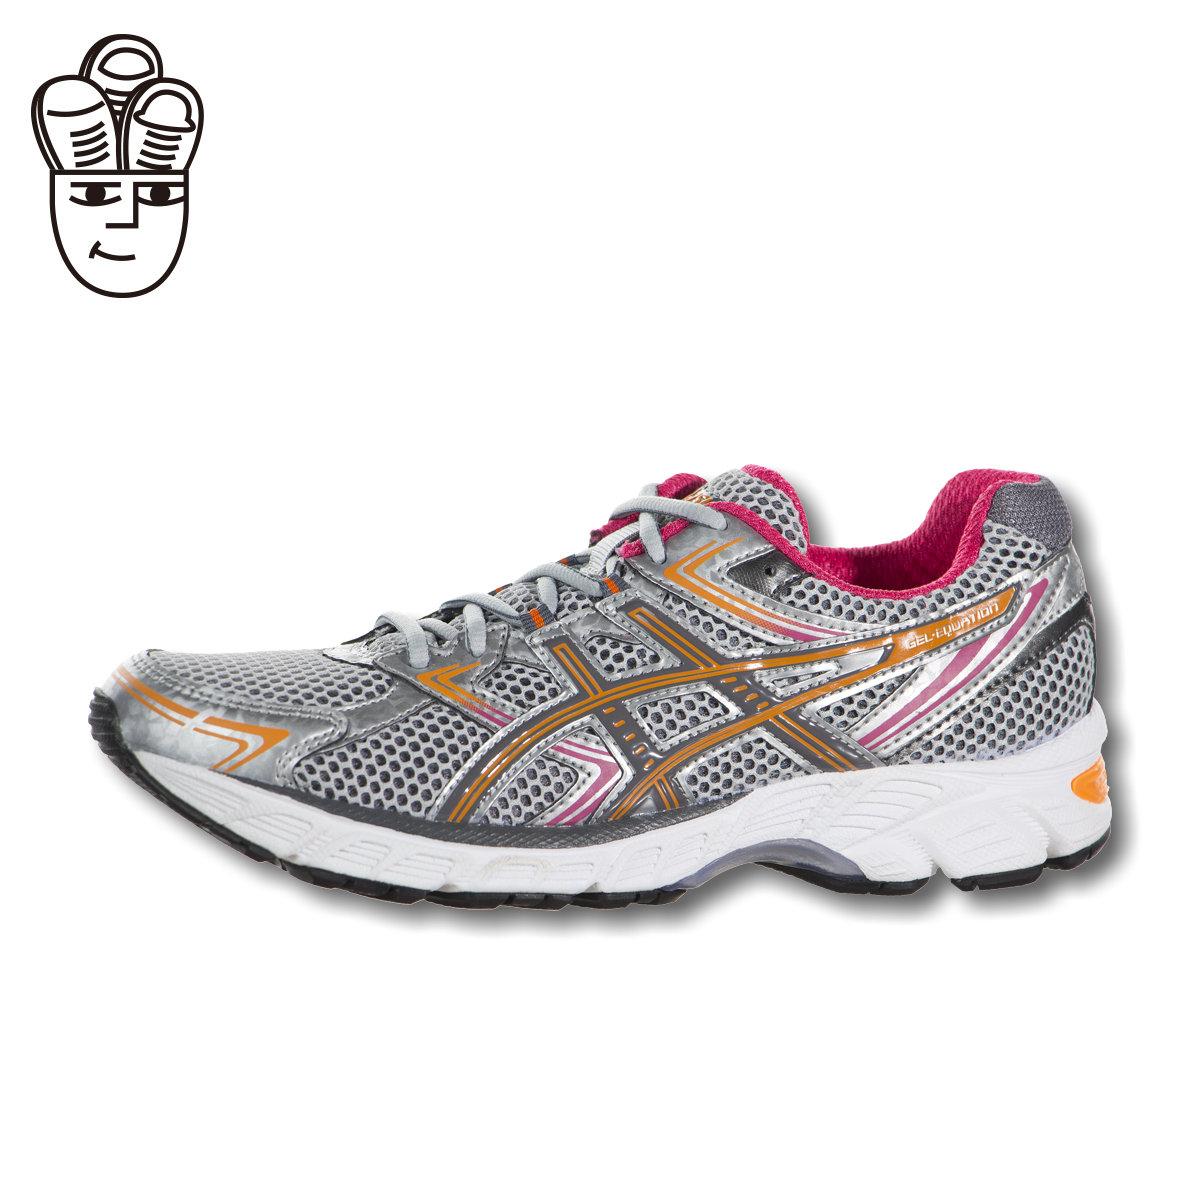 Buy Asics asics asics gel-equation 7 women  39 s professional running shoes  cushion running shoes in Cheap Price on m.alibaba.com 0ec7184fb3